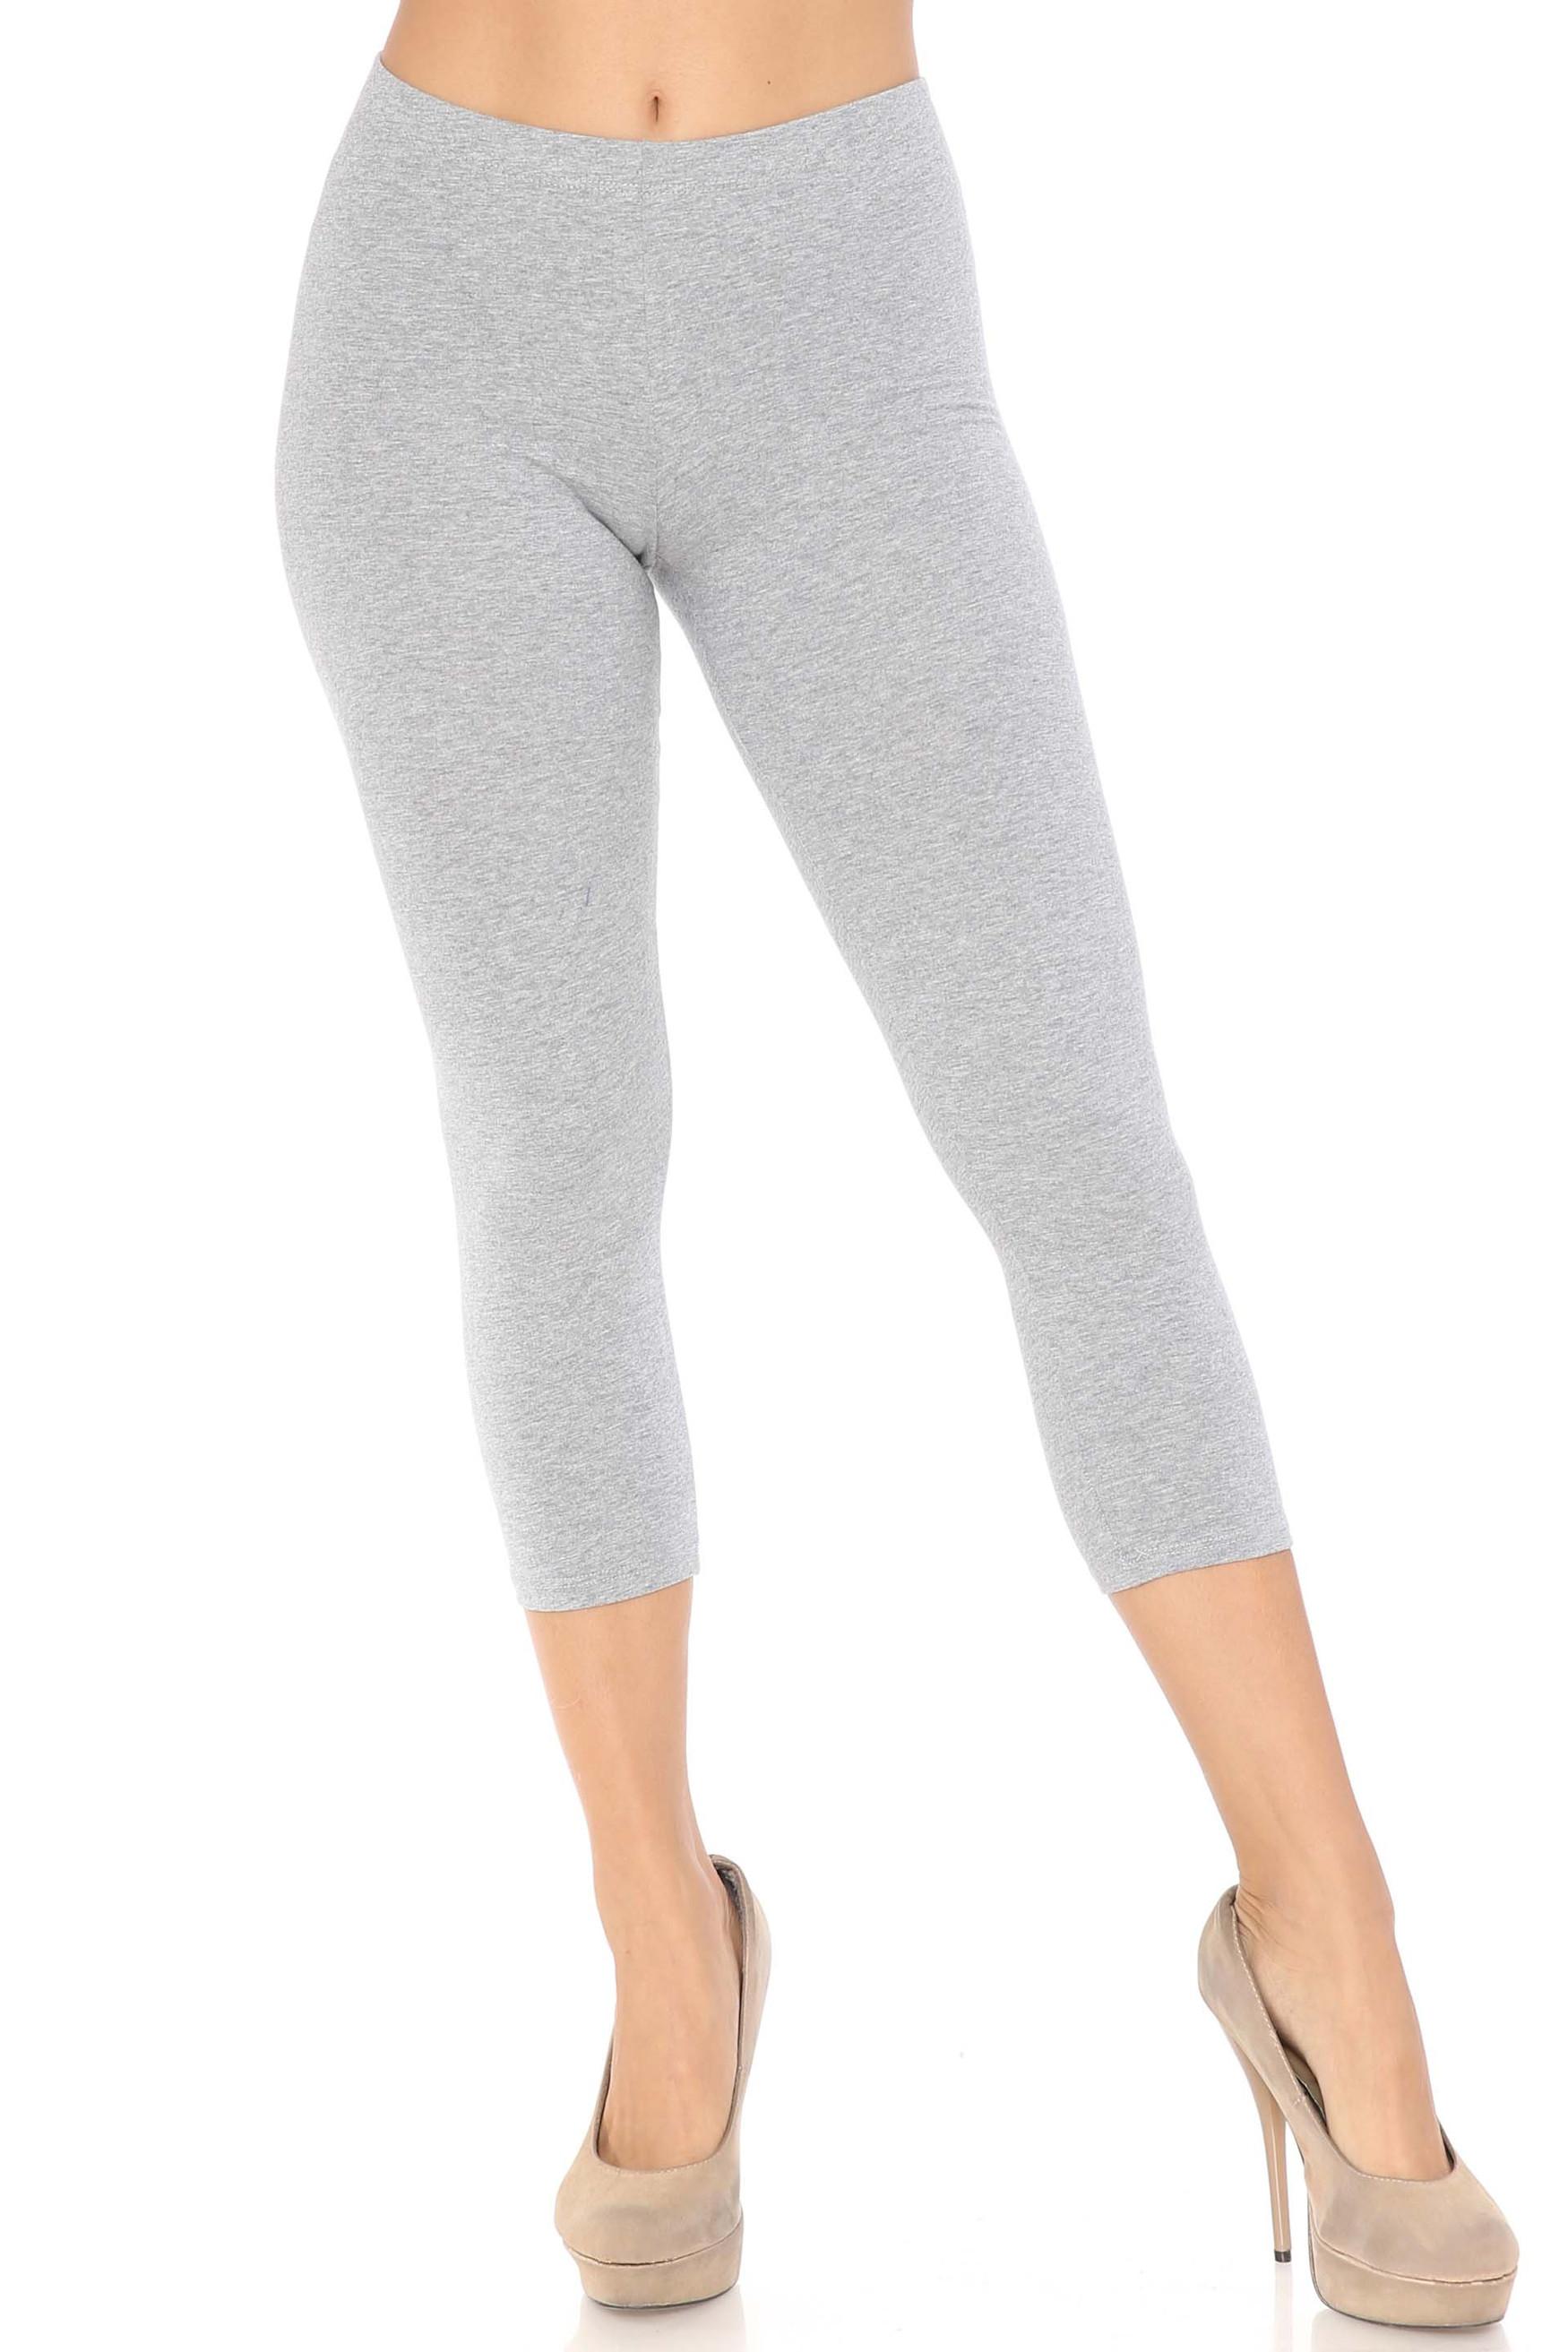 Front view of heather gray USA Cotton Capri Length Leggings